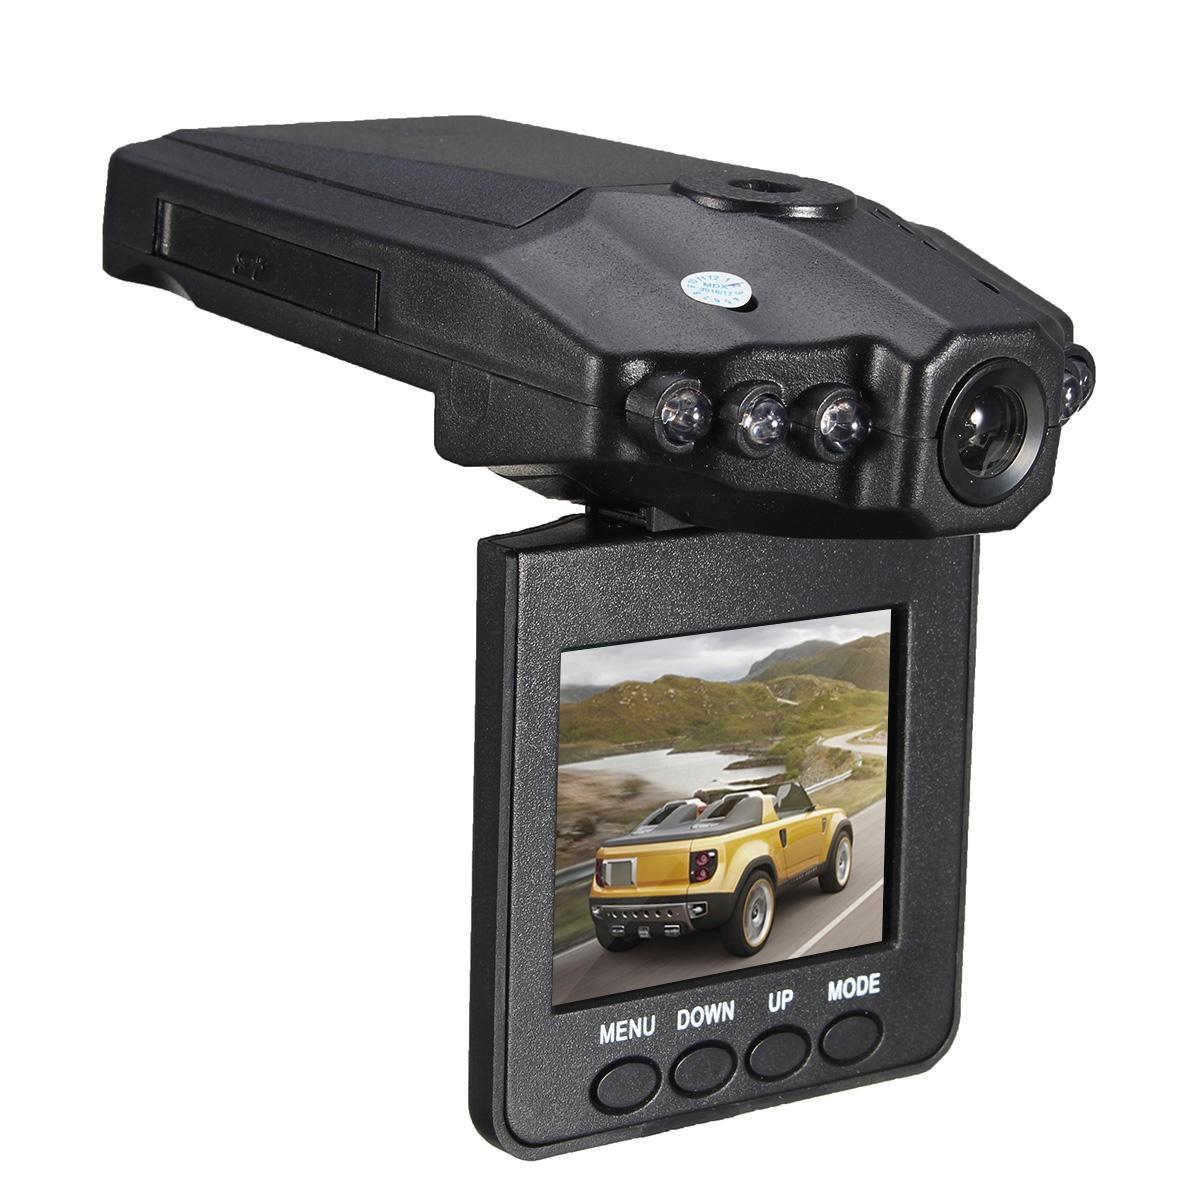 "Camera auto HD cu display 2.5"""" TFT rabatabil 270 grade, 6 leduri cu infrarosu si senzor de miscare+cadou imagine techstar.ro 2021"